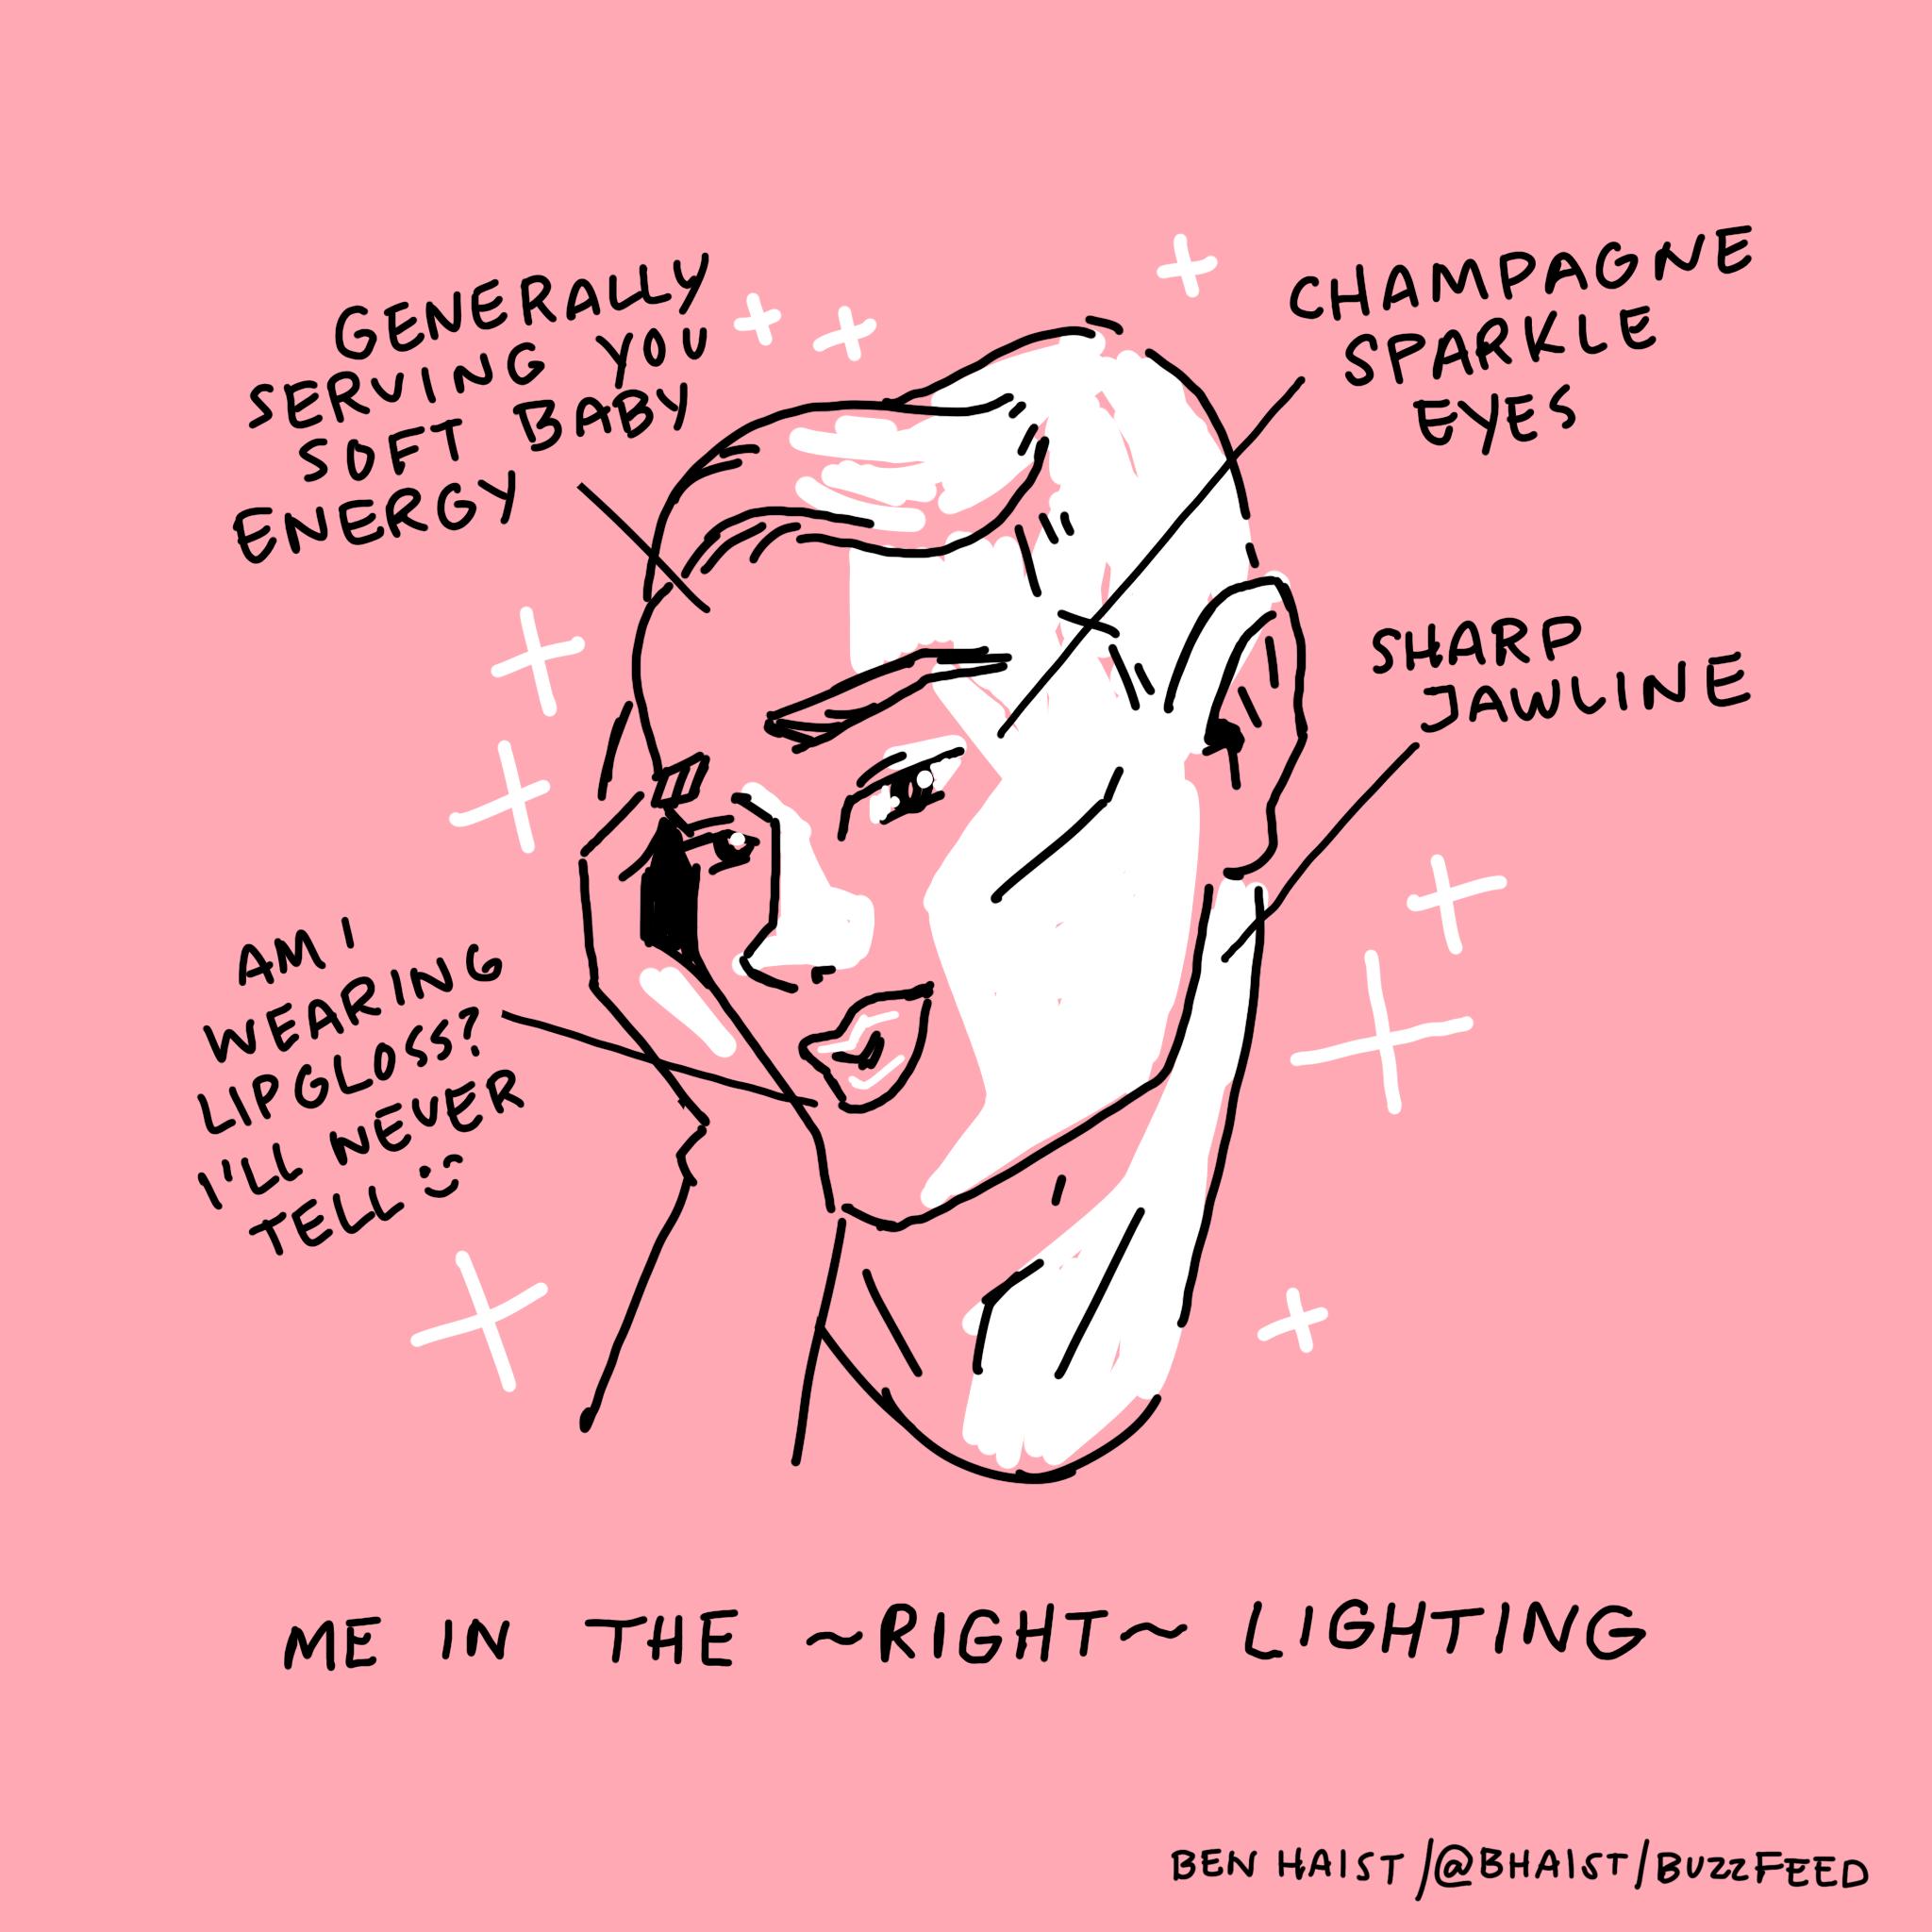 RightLightingComic_01.png